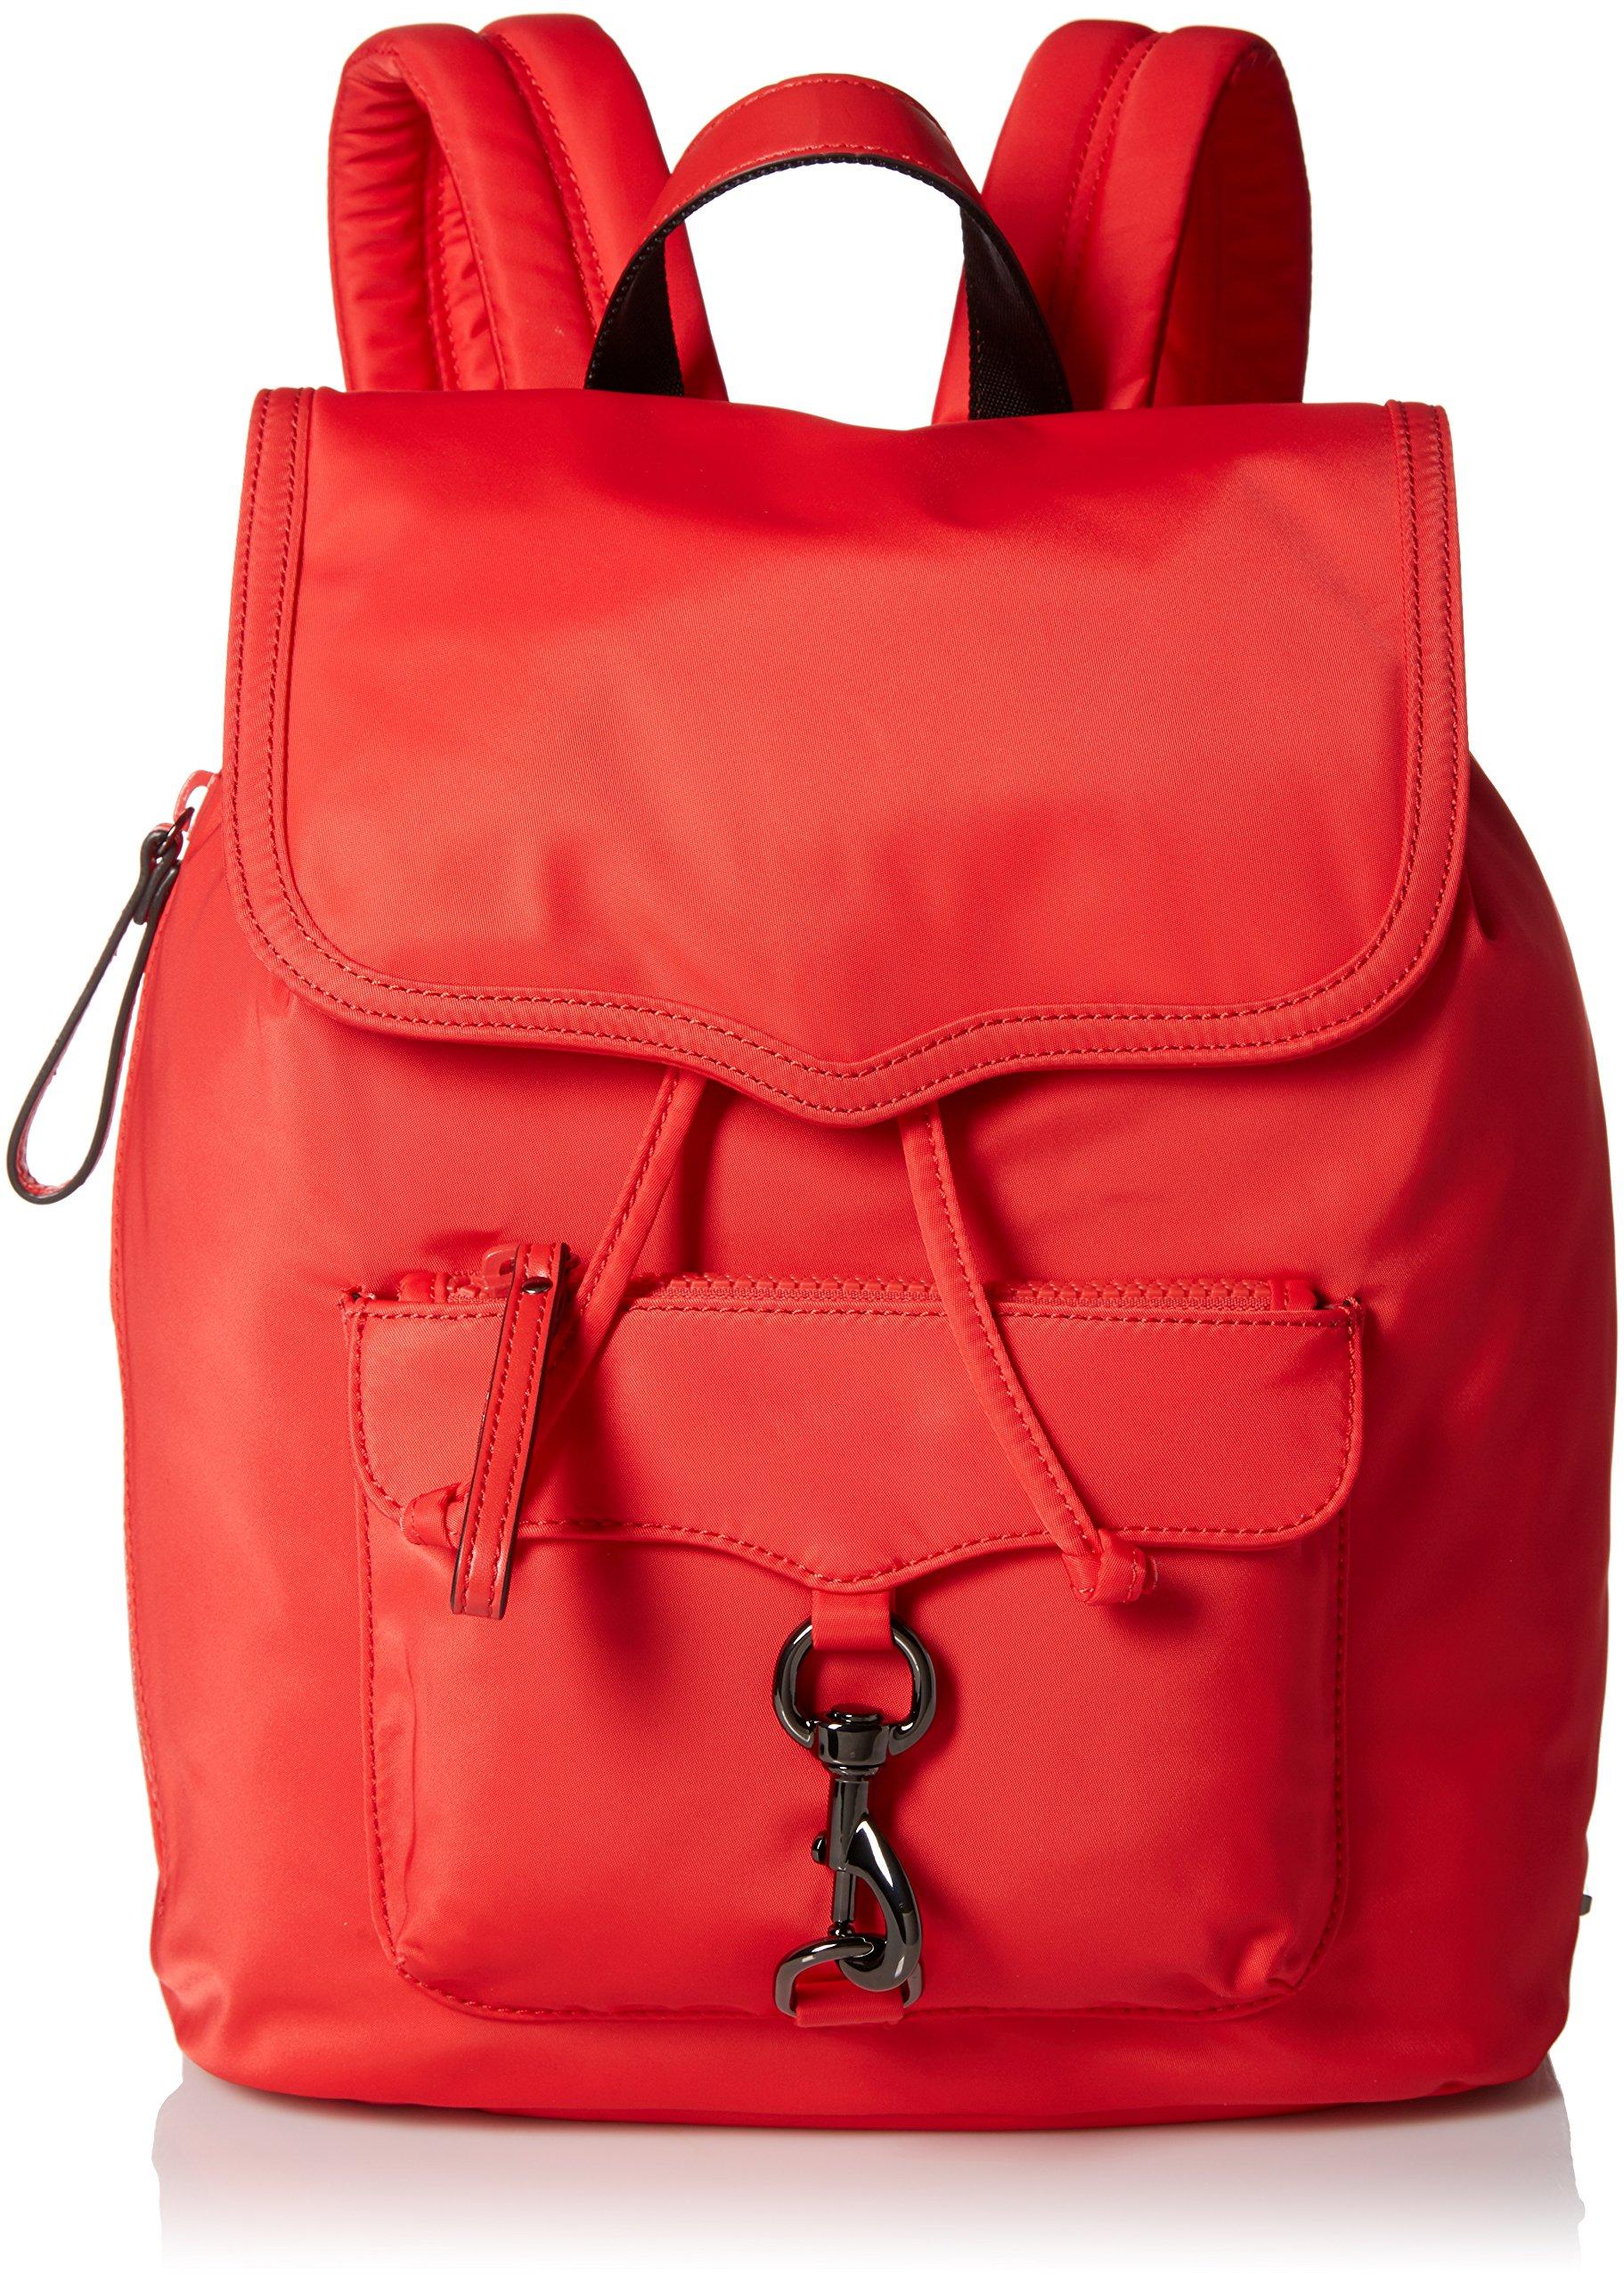 Rebecca Minkoff Bikeshare Bag, Red